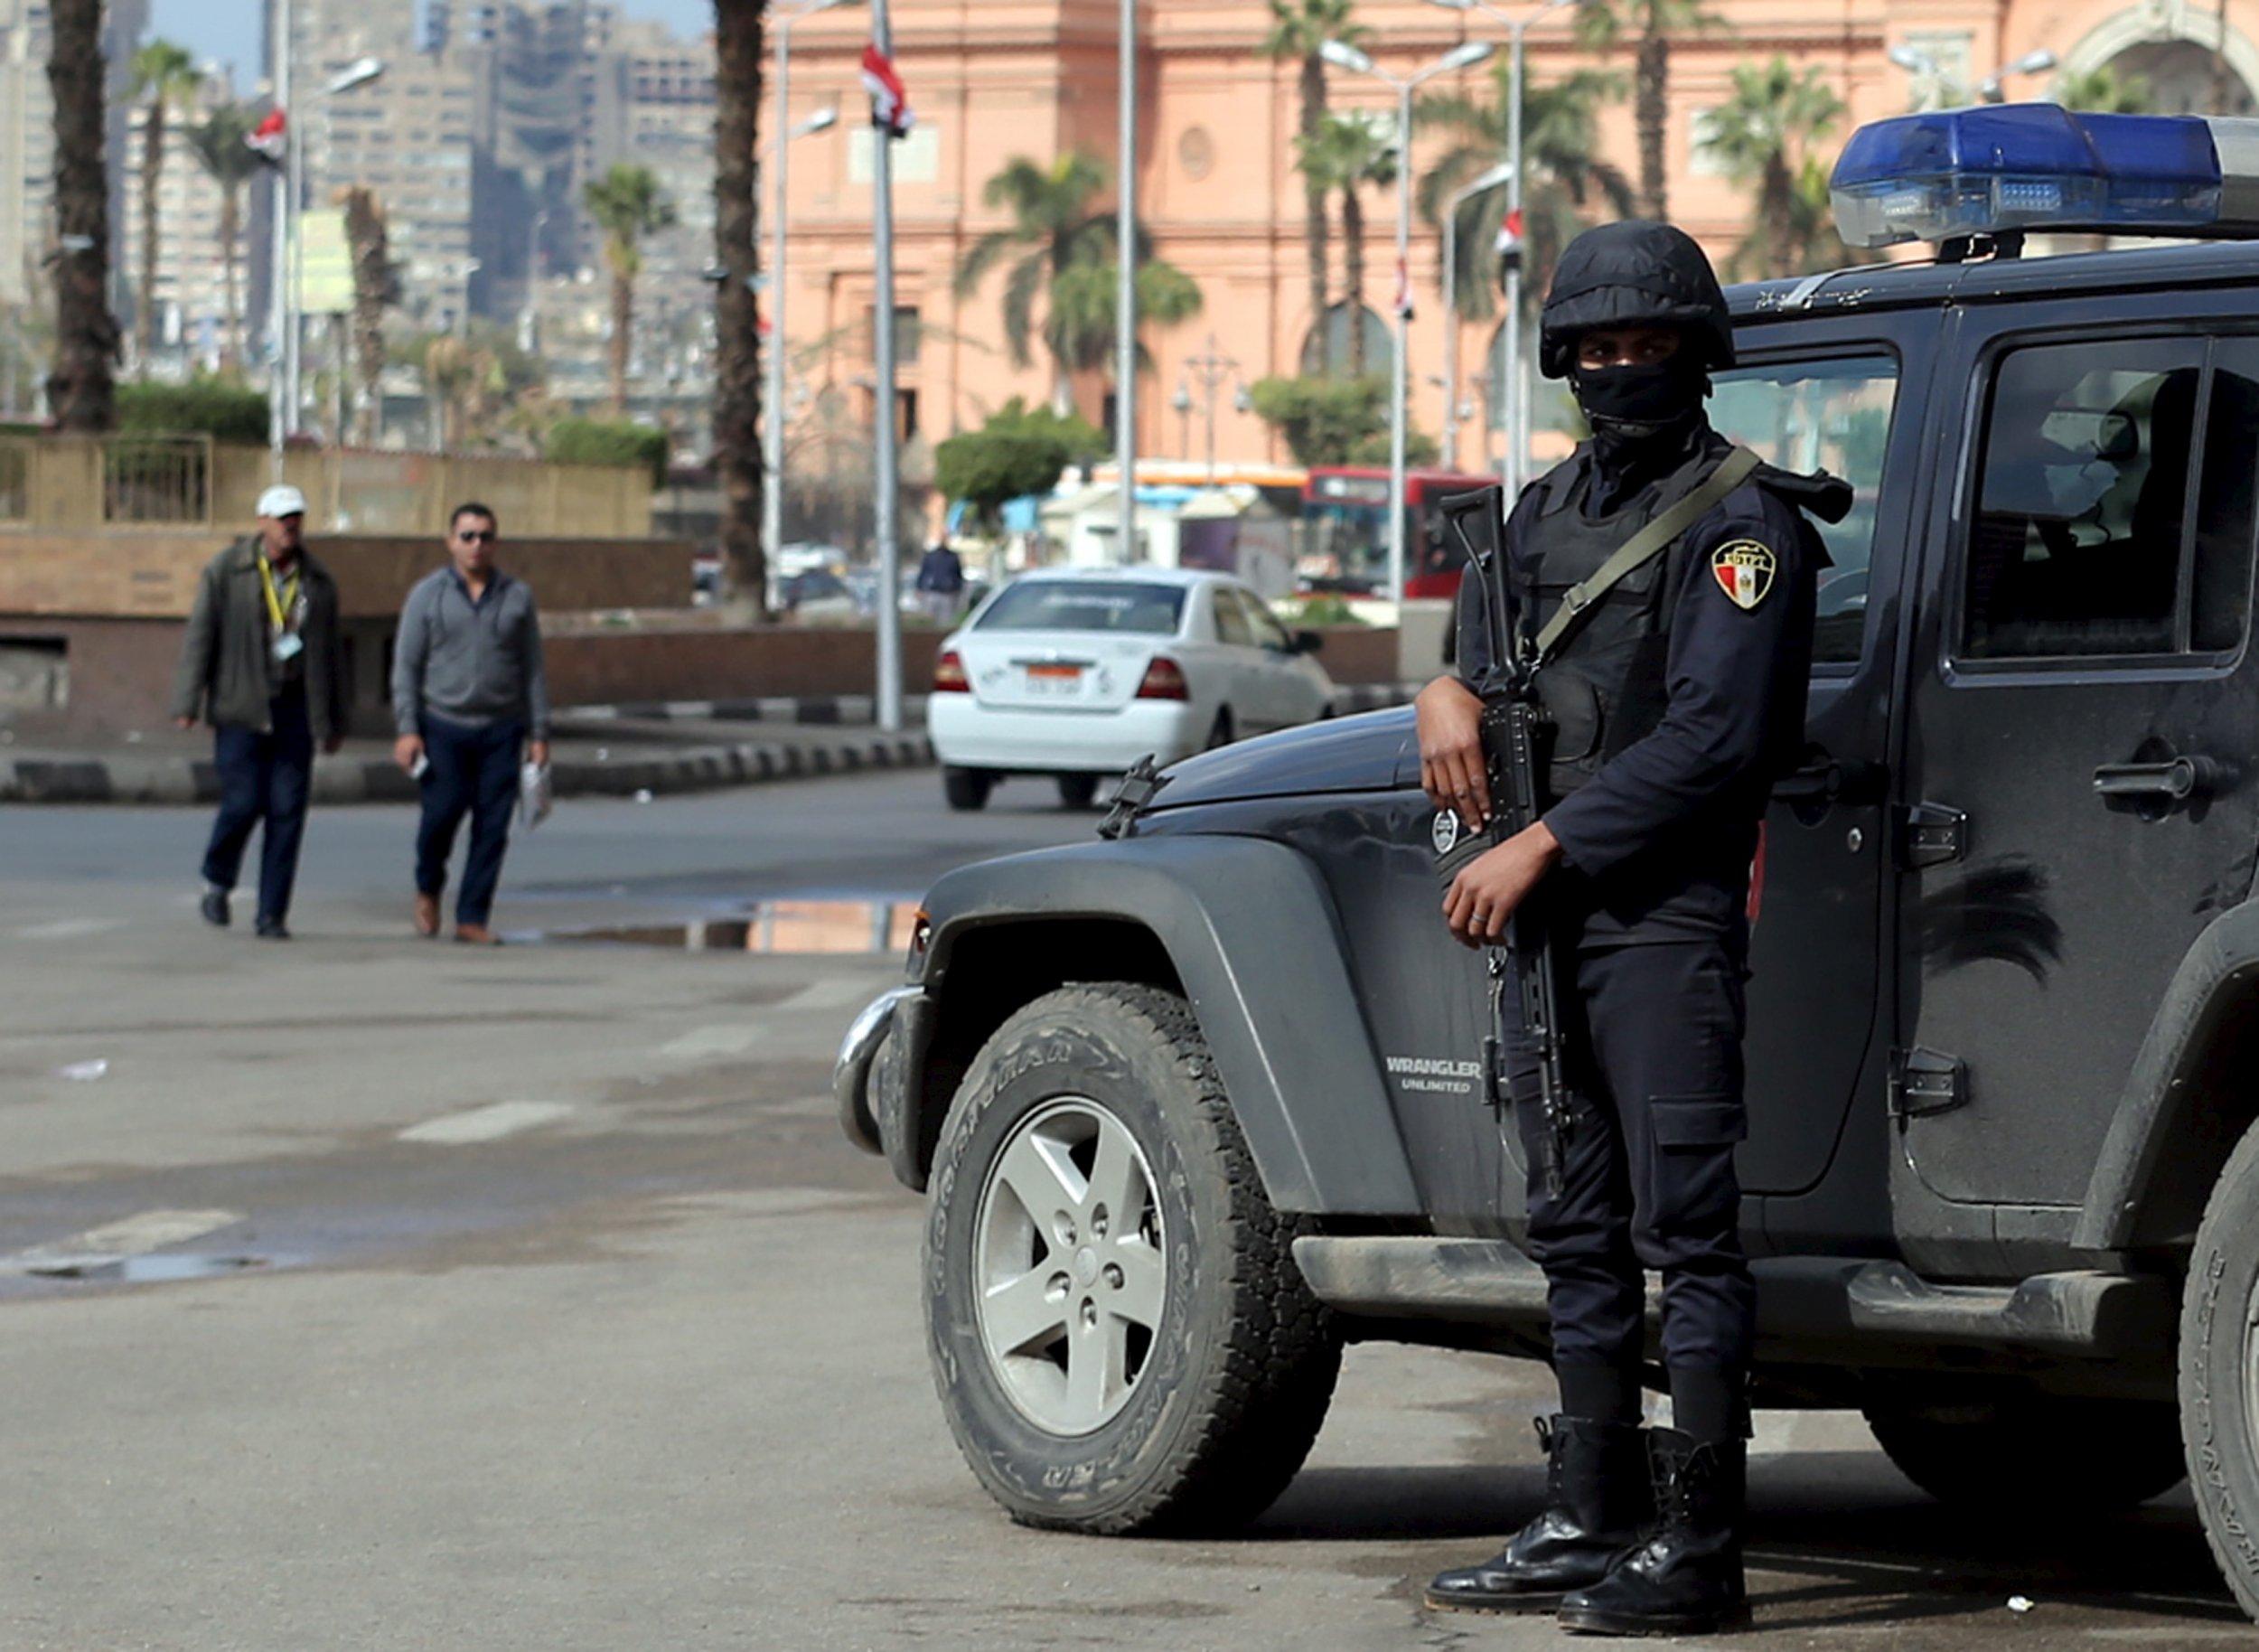 0125_Egypt_Arab_Spring_Anniversary_01